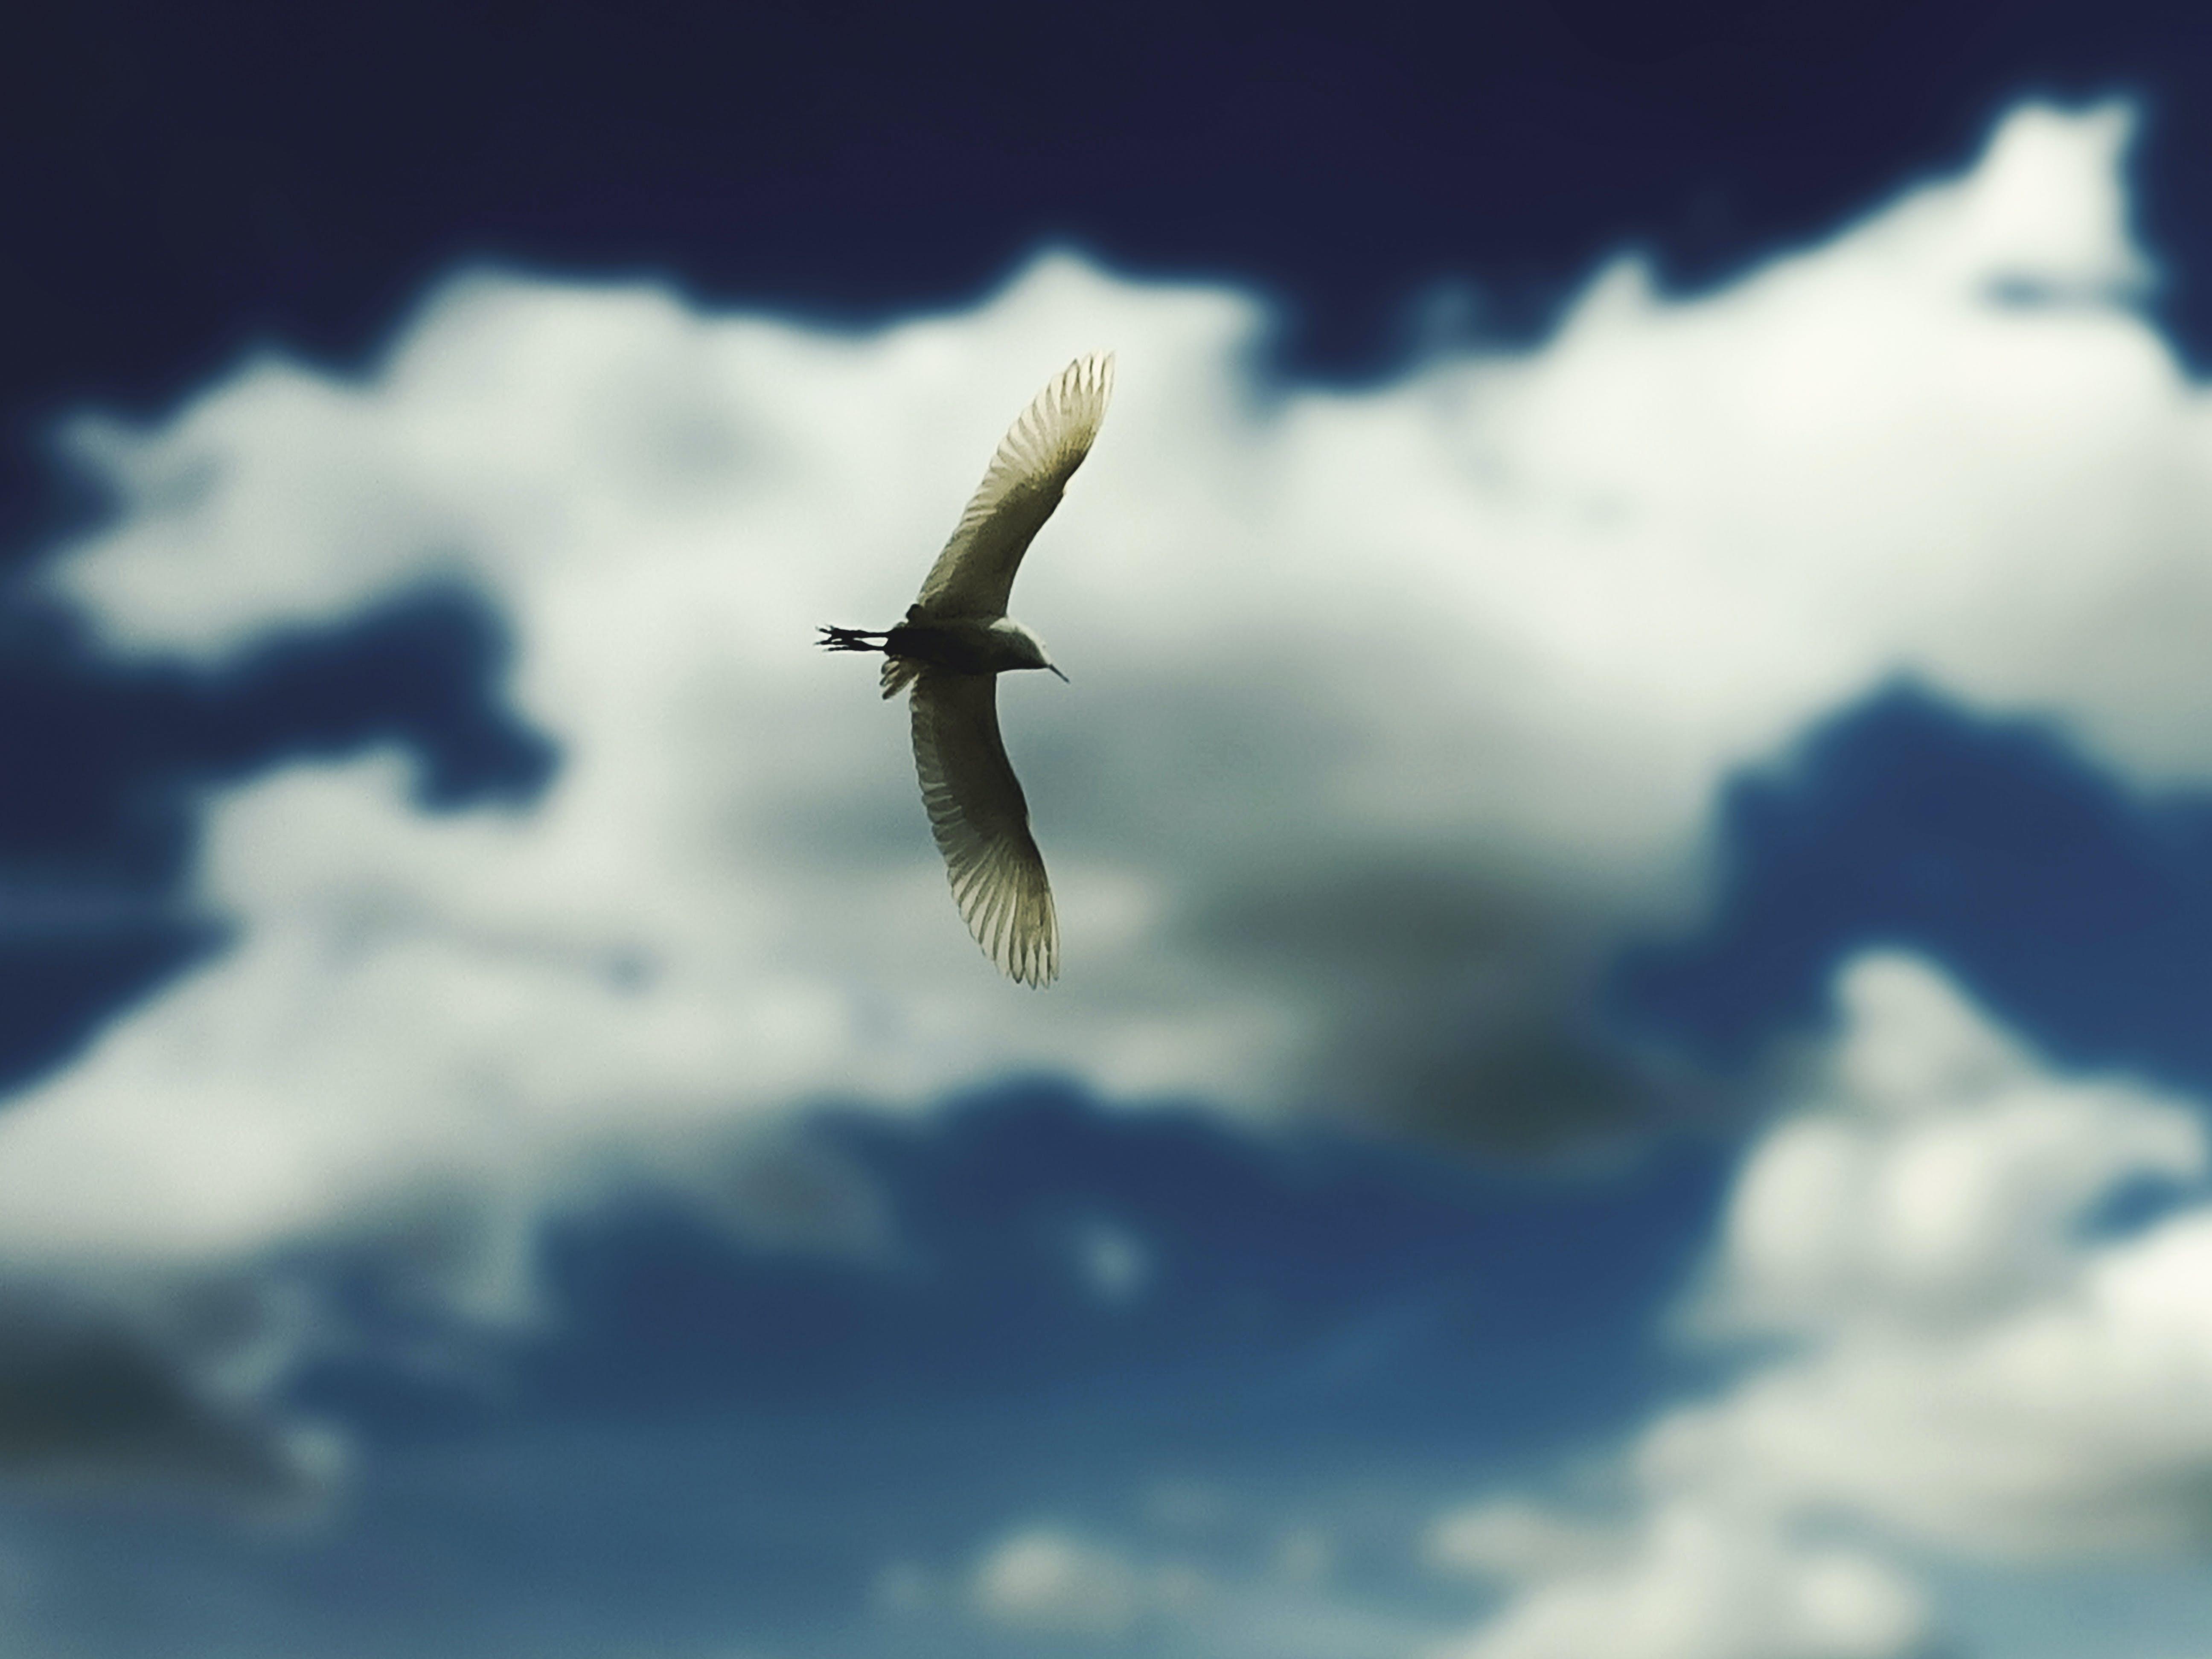 Free stock photo of animal, bird, bird photography, birdpicture